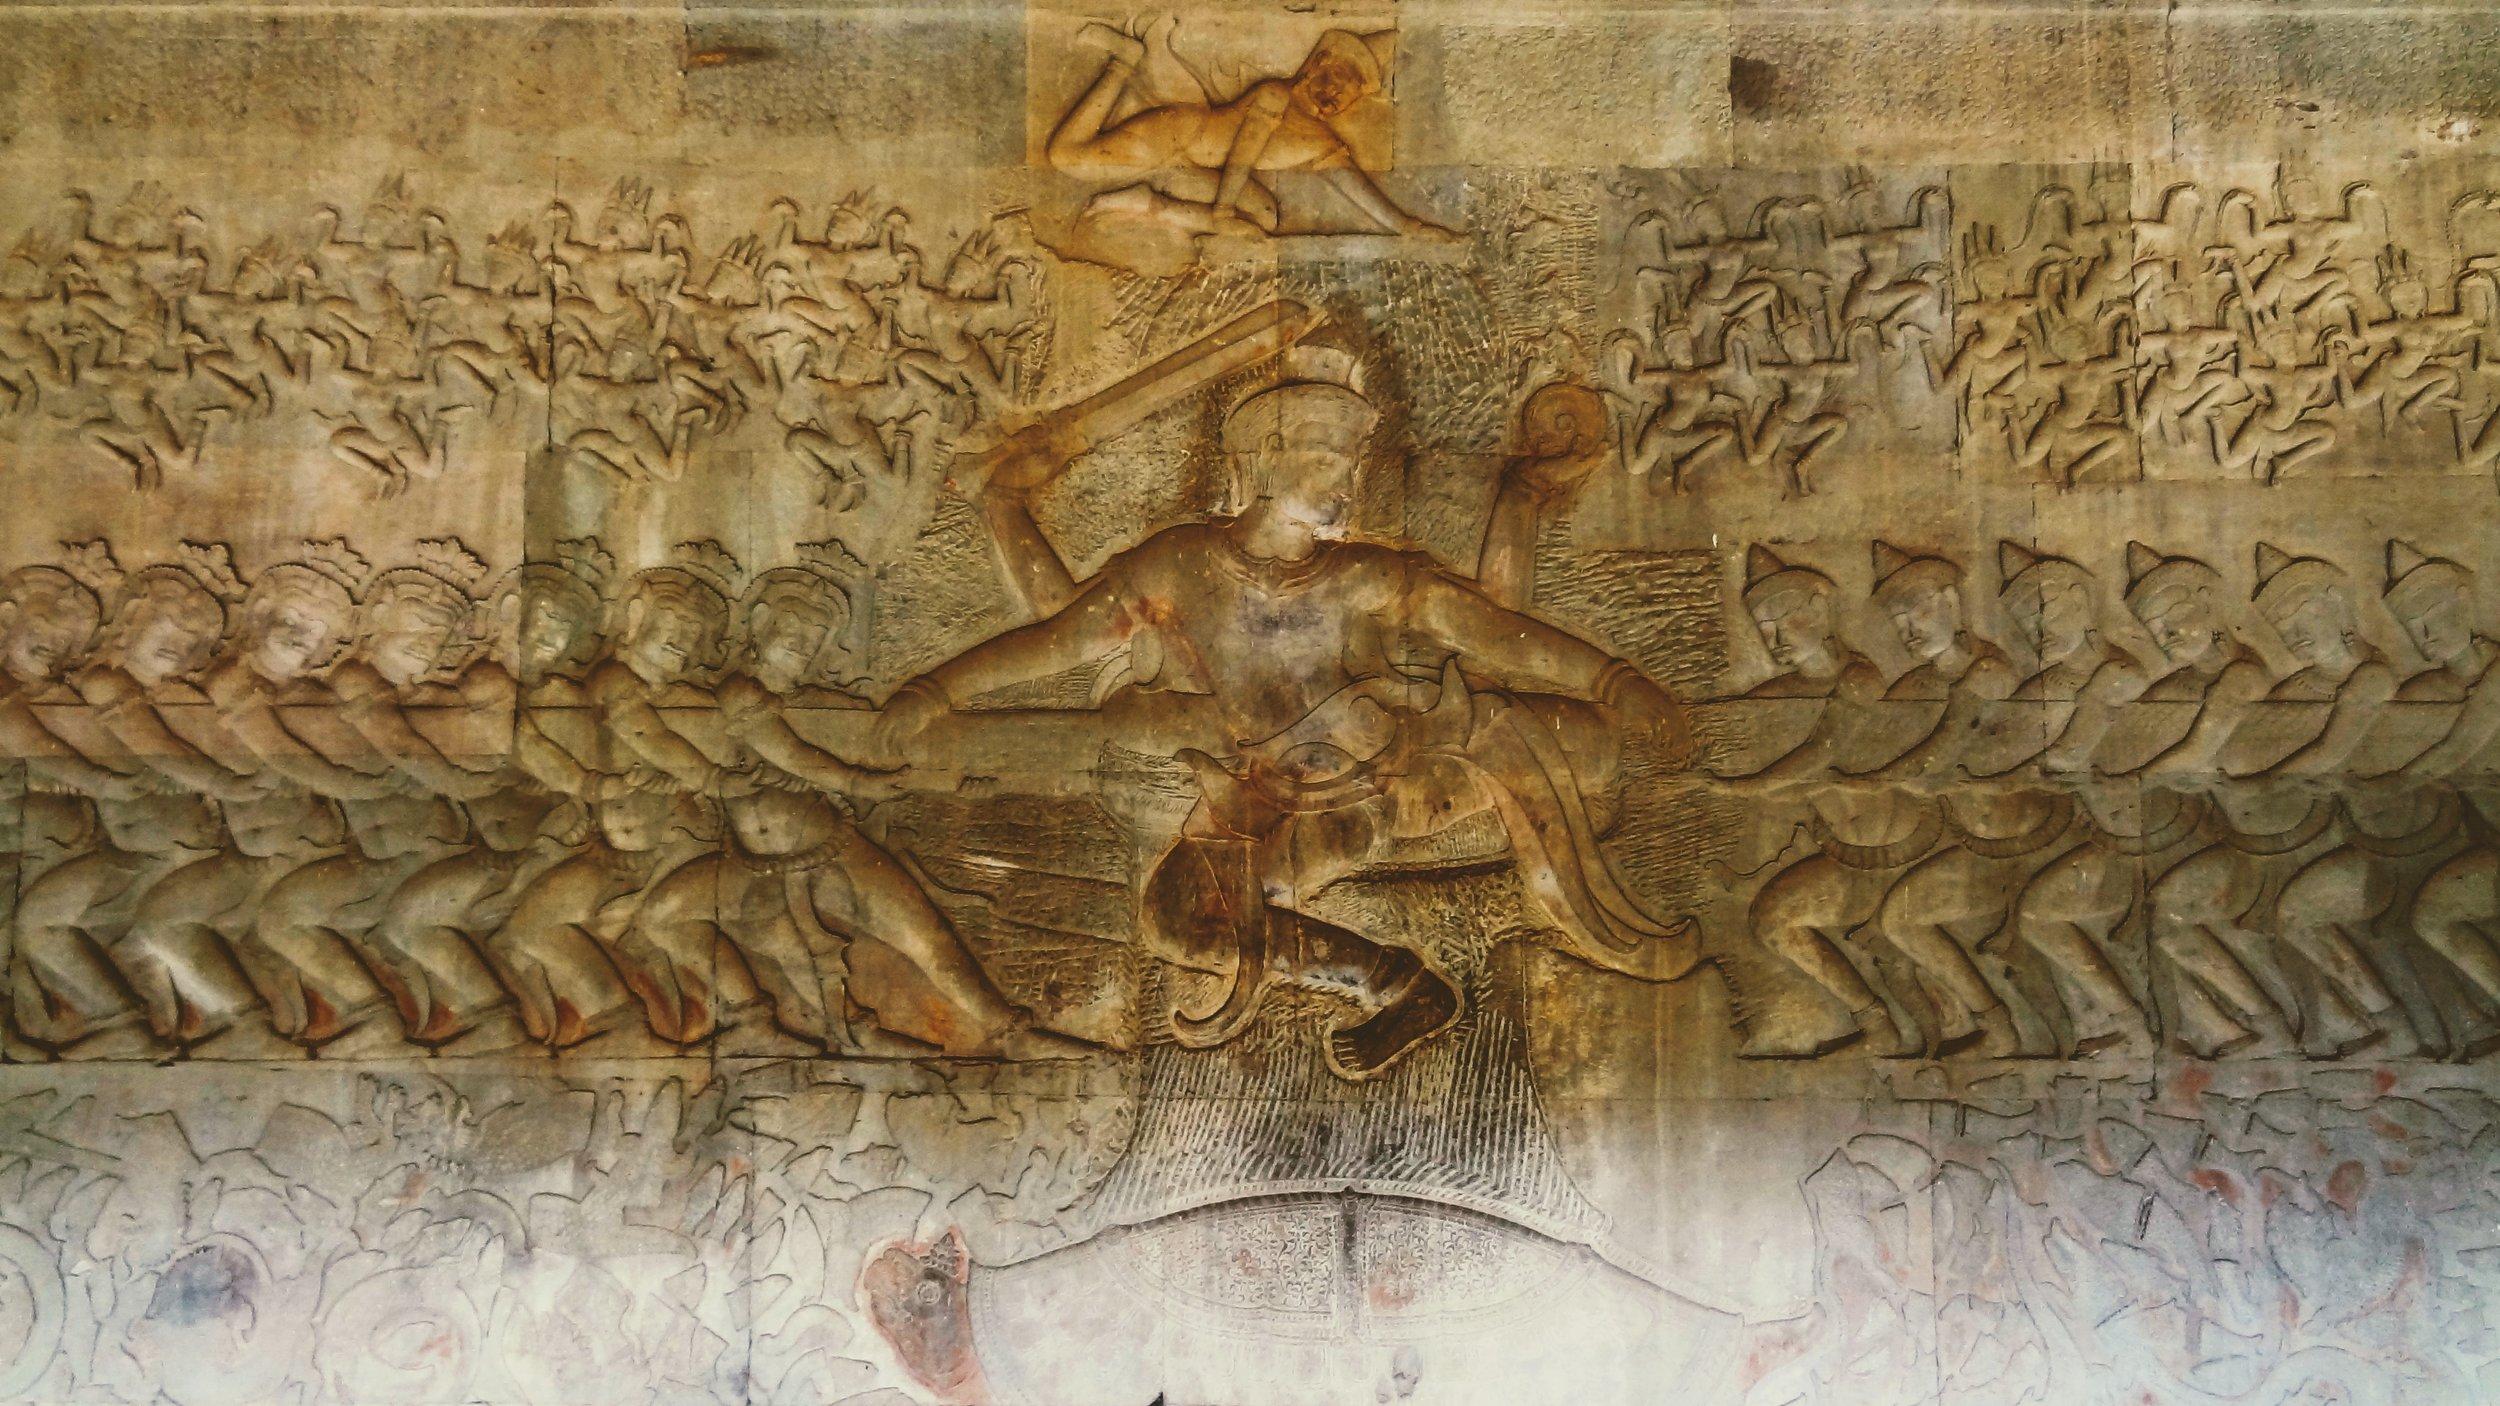 The Churning of the Ocean of Milk (សមុទ្រ មន្ថន) symbolises end of war, strife and the struggle for supremacy, and with it the emergence of the political order, hence the allusion to immortality (អម្រឹត); Image:  Olaf Tausch  (2015), Wikimedia Commons; CC BY 3.0  Description: Wischnu in der Mitte beim Quirlen des Milchmeeres, Südflügel der Ostseite der dritten Galerie des Tempels von Angkor Wat (អង្គរវត្ត 'Tempelstadt), Provinz Siem Reap, Kambodscha